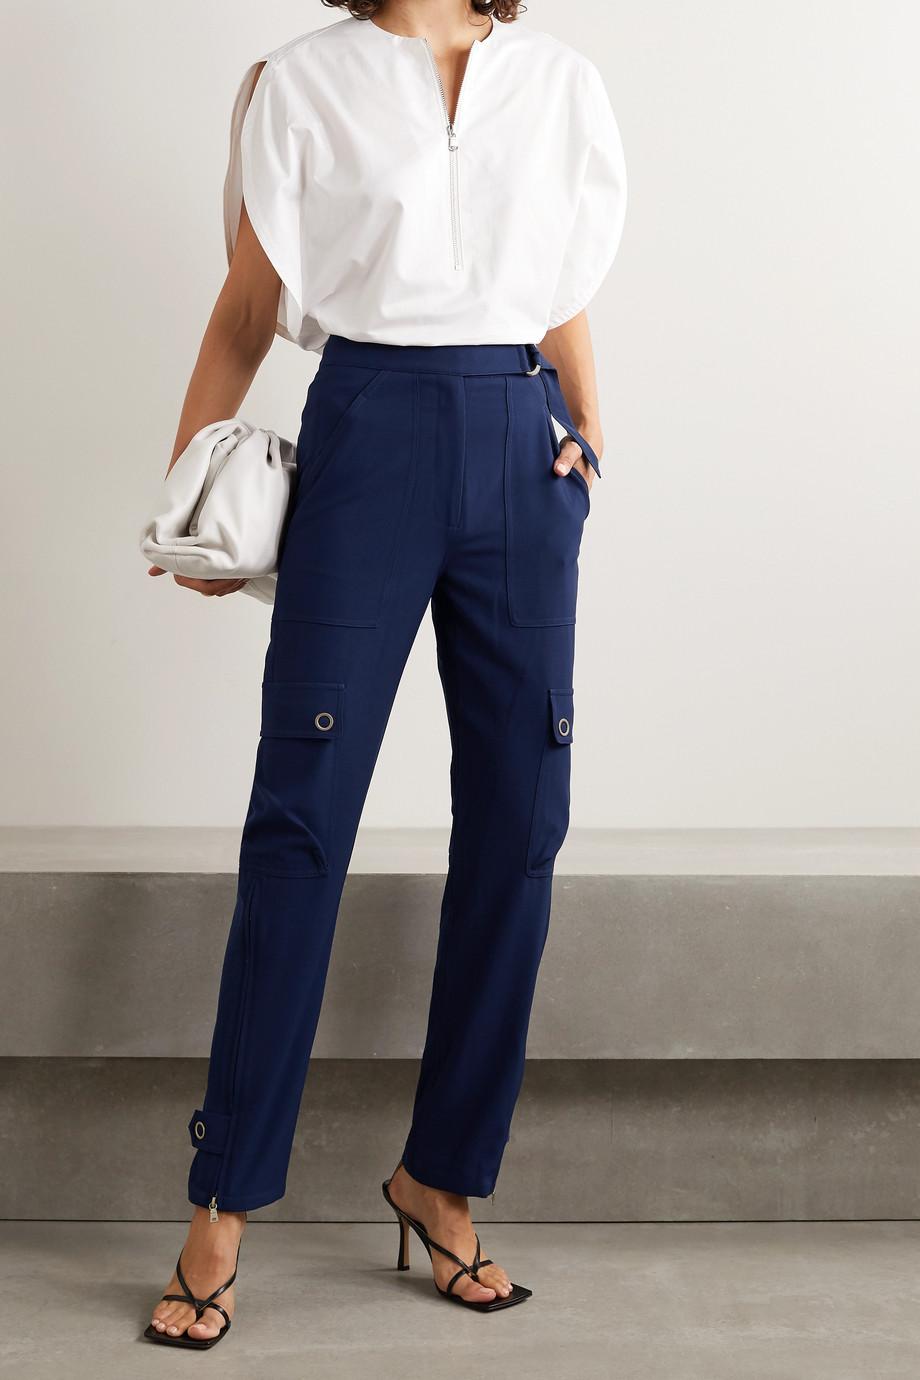 Jonathan Simkhai Lianna belted woven tapered cargo pants